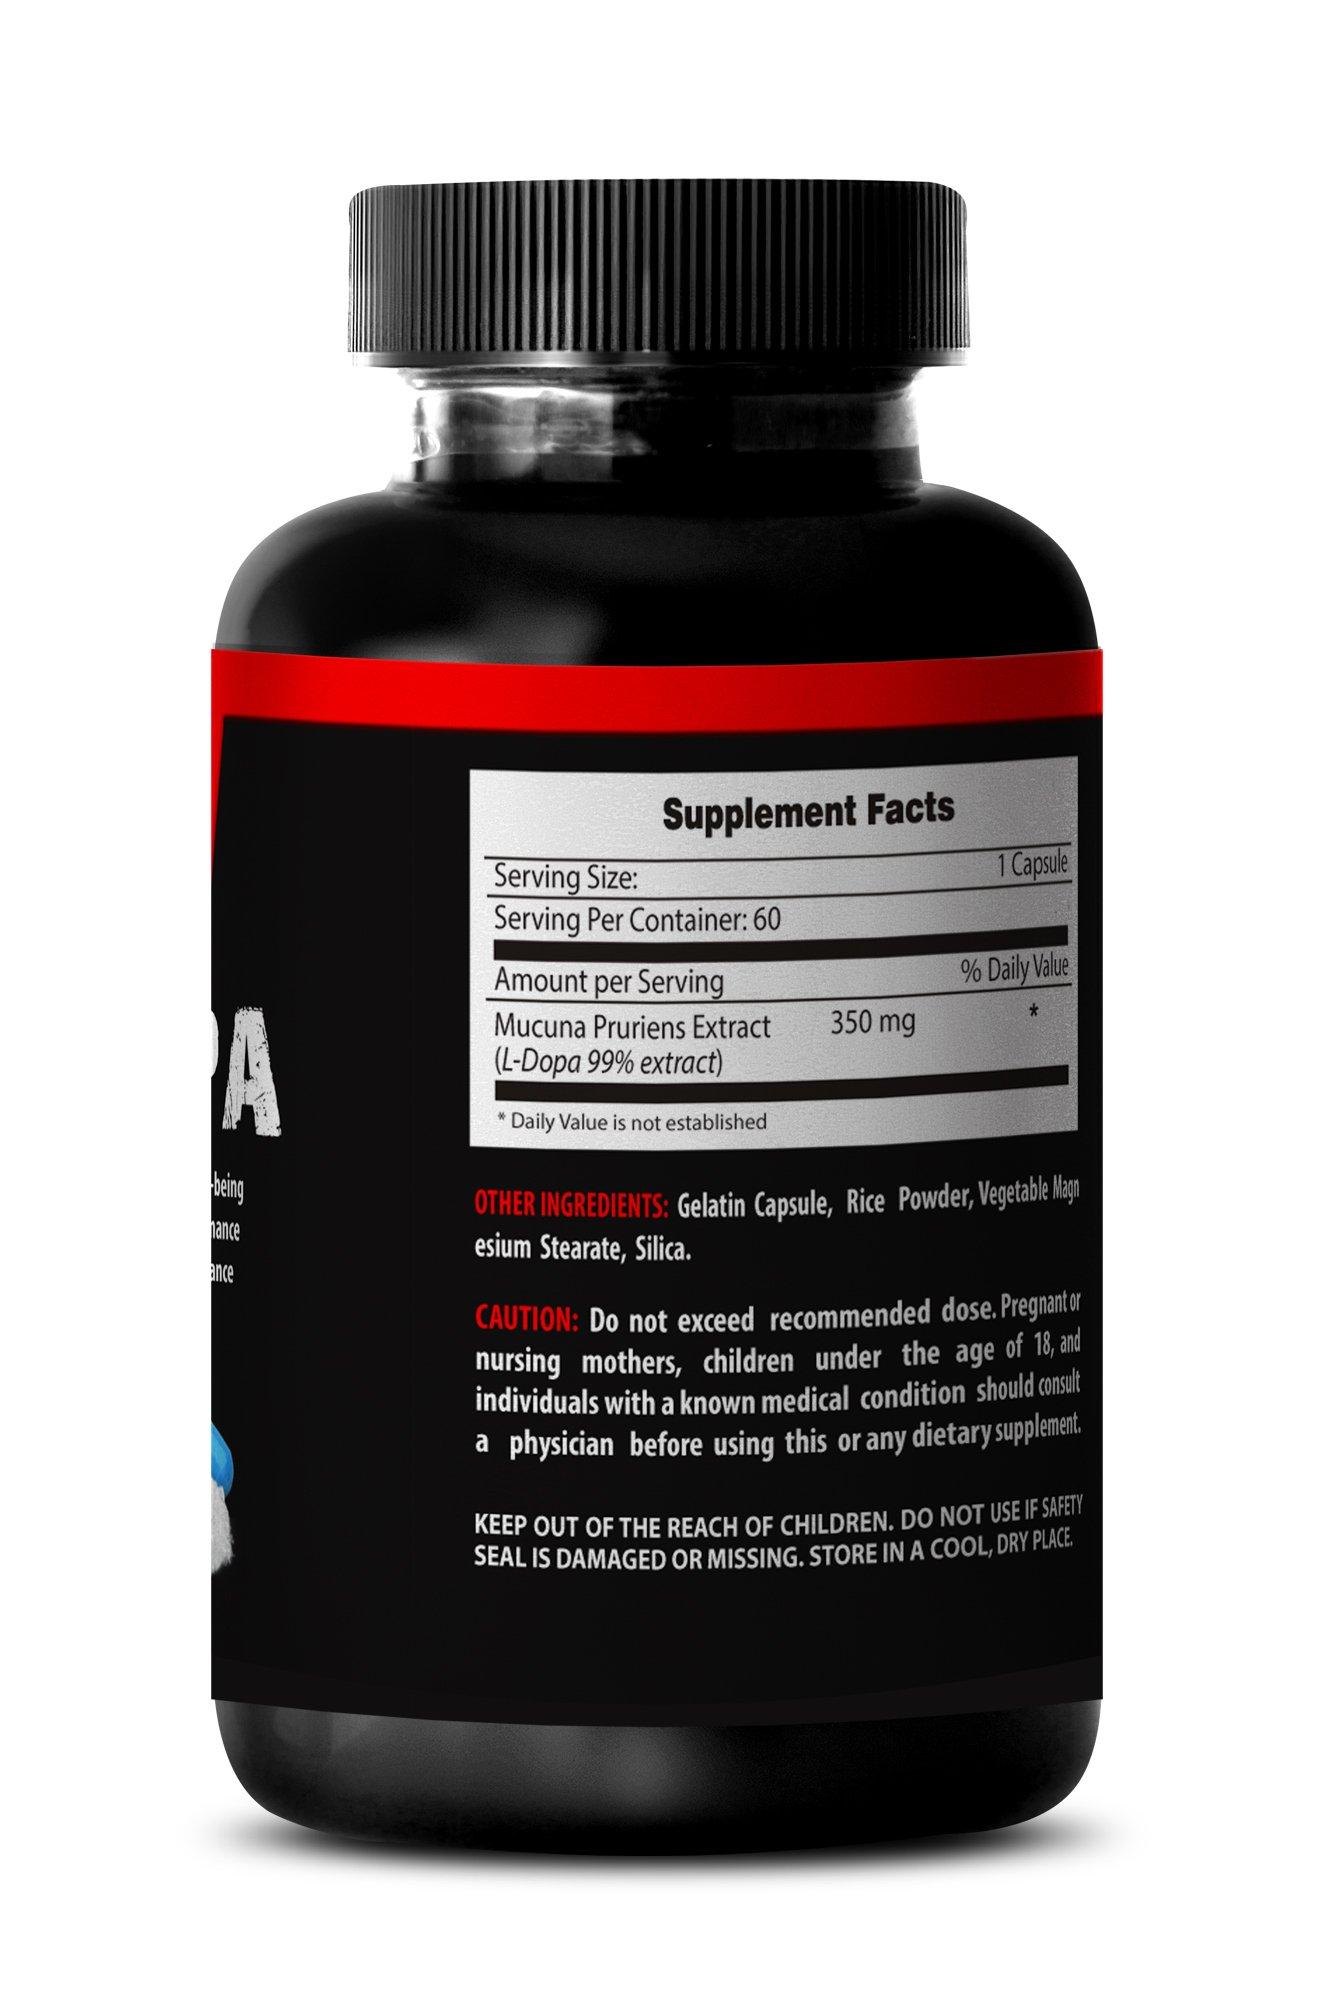 Macuna Pruriens L-Dopa Powder - Mucuna Pruriens Extract (6 bottles 360 capsules) by VIP VITAMINS (Image #4)